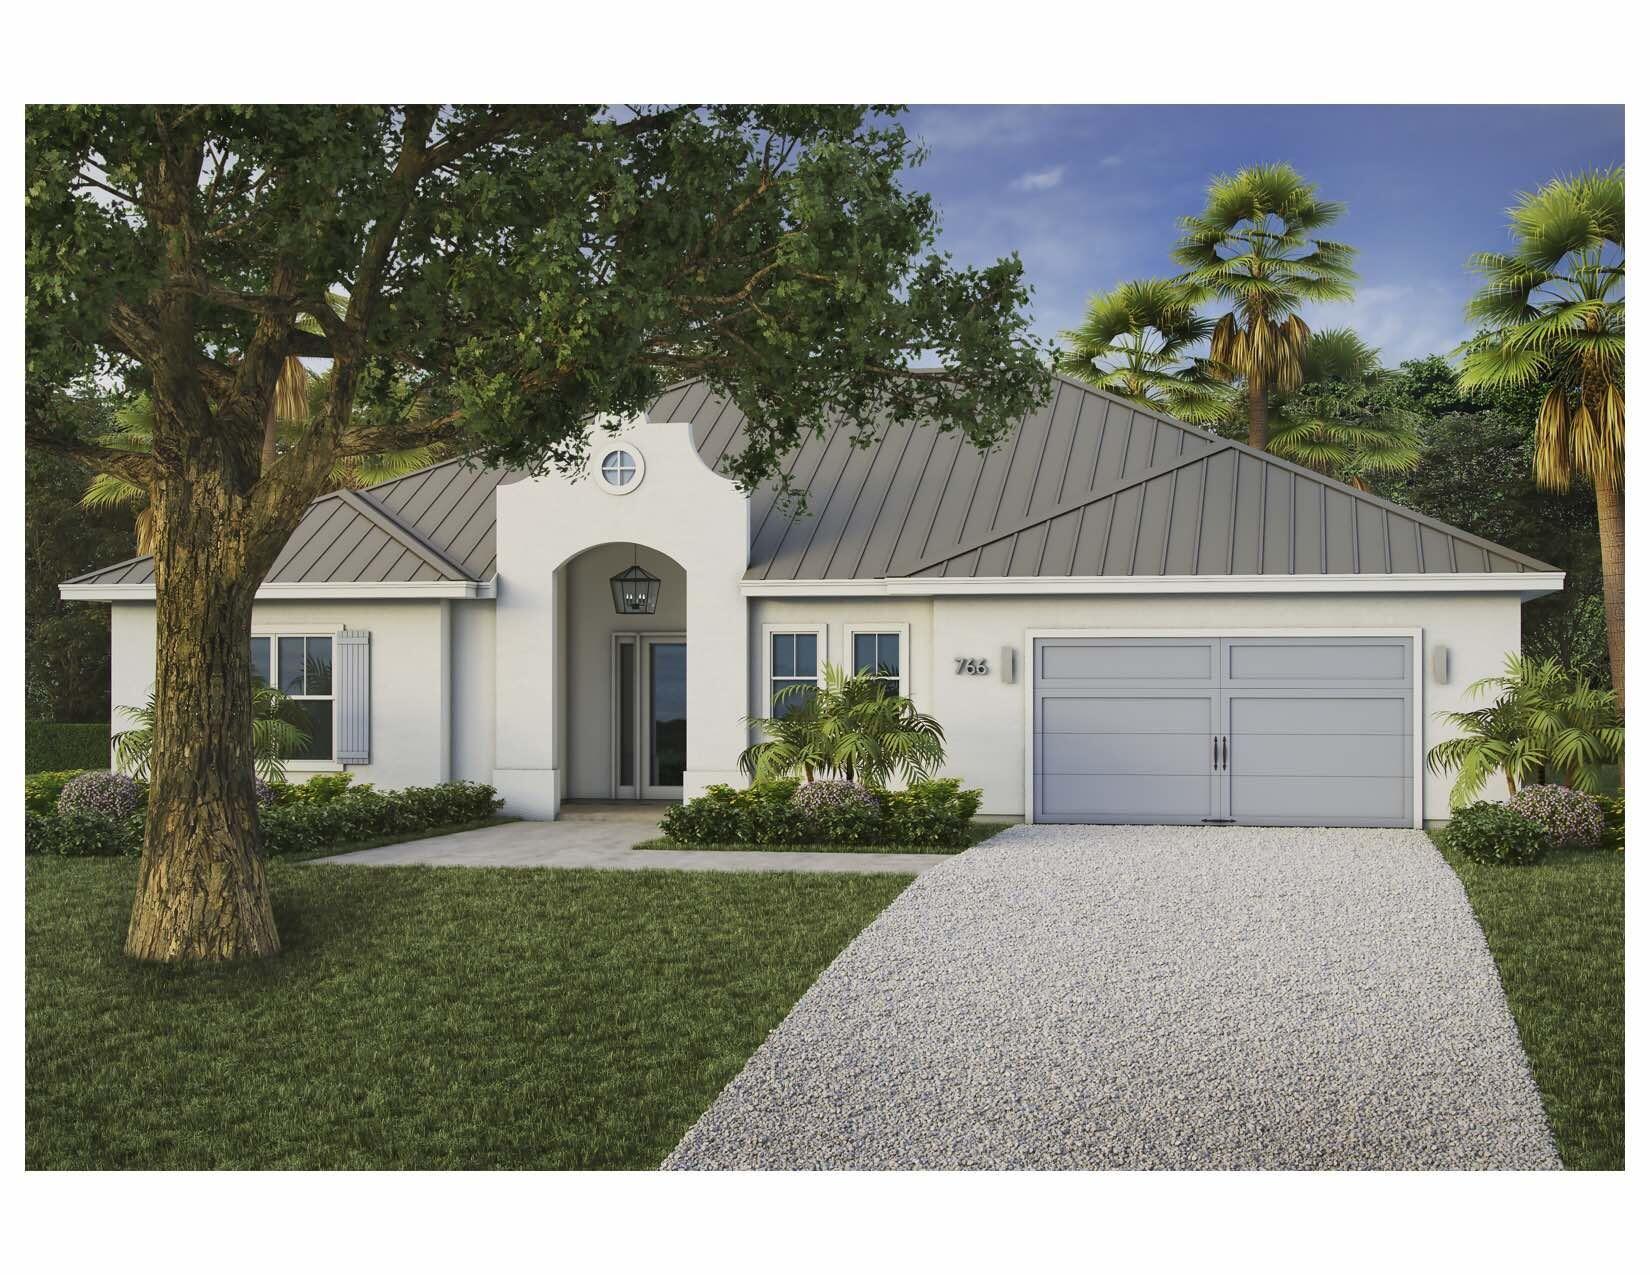 766 Fiddlewood Road, Vero Beach, FL 32963 - #: RX-10703331